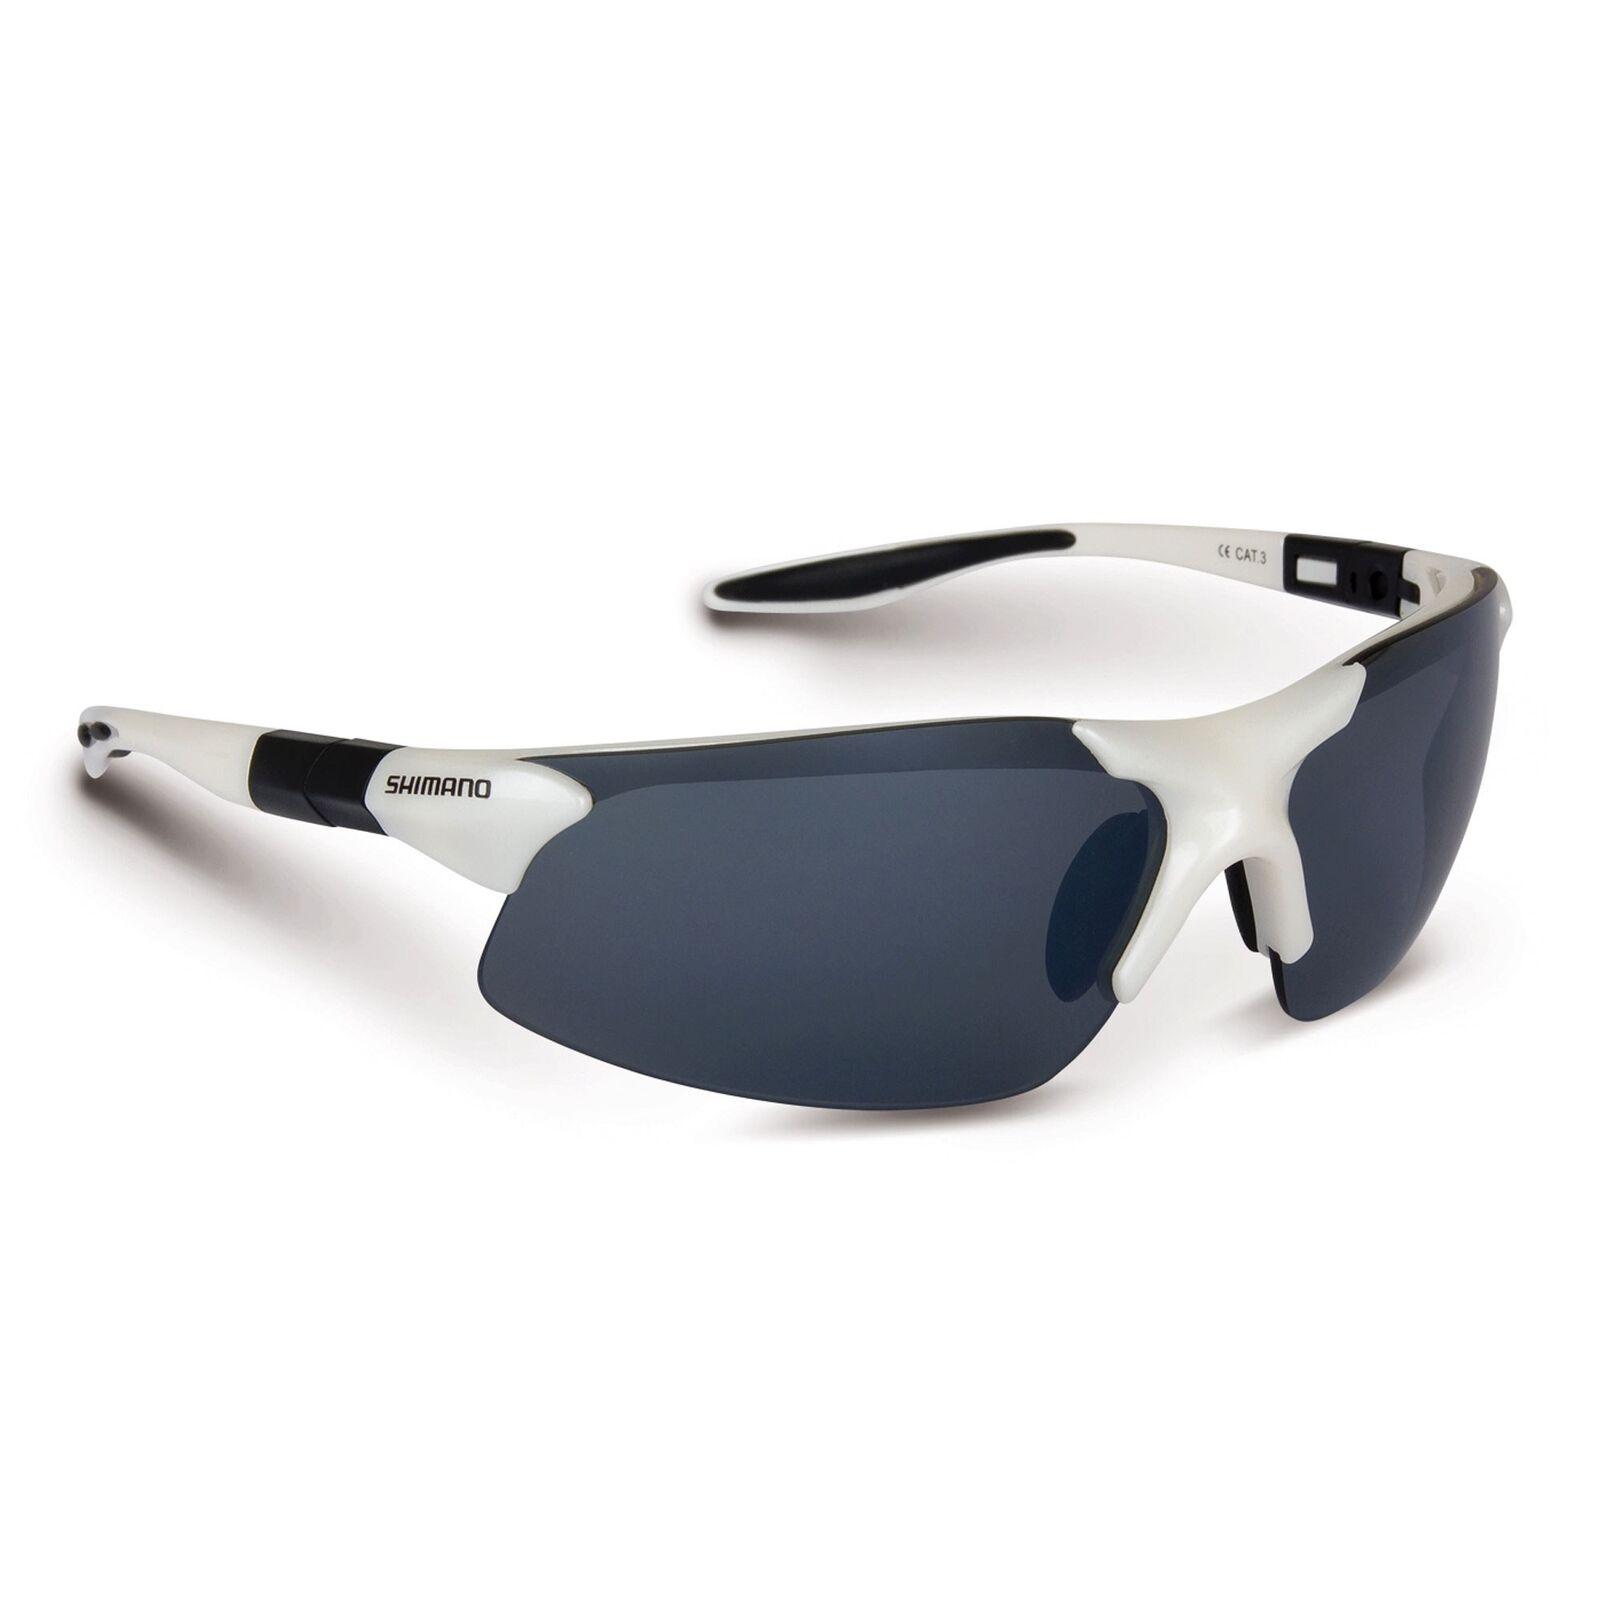 Shimano Shimano Shimano Polarisationsbrille Sunglass - Stradic - grau - Polbrille 090441